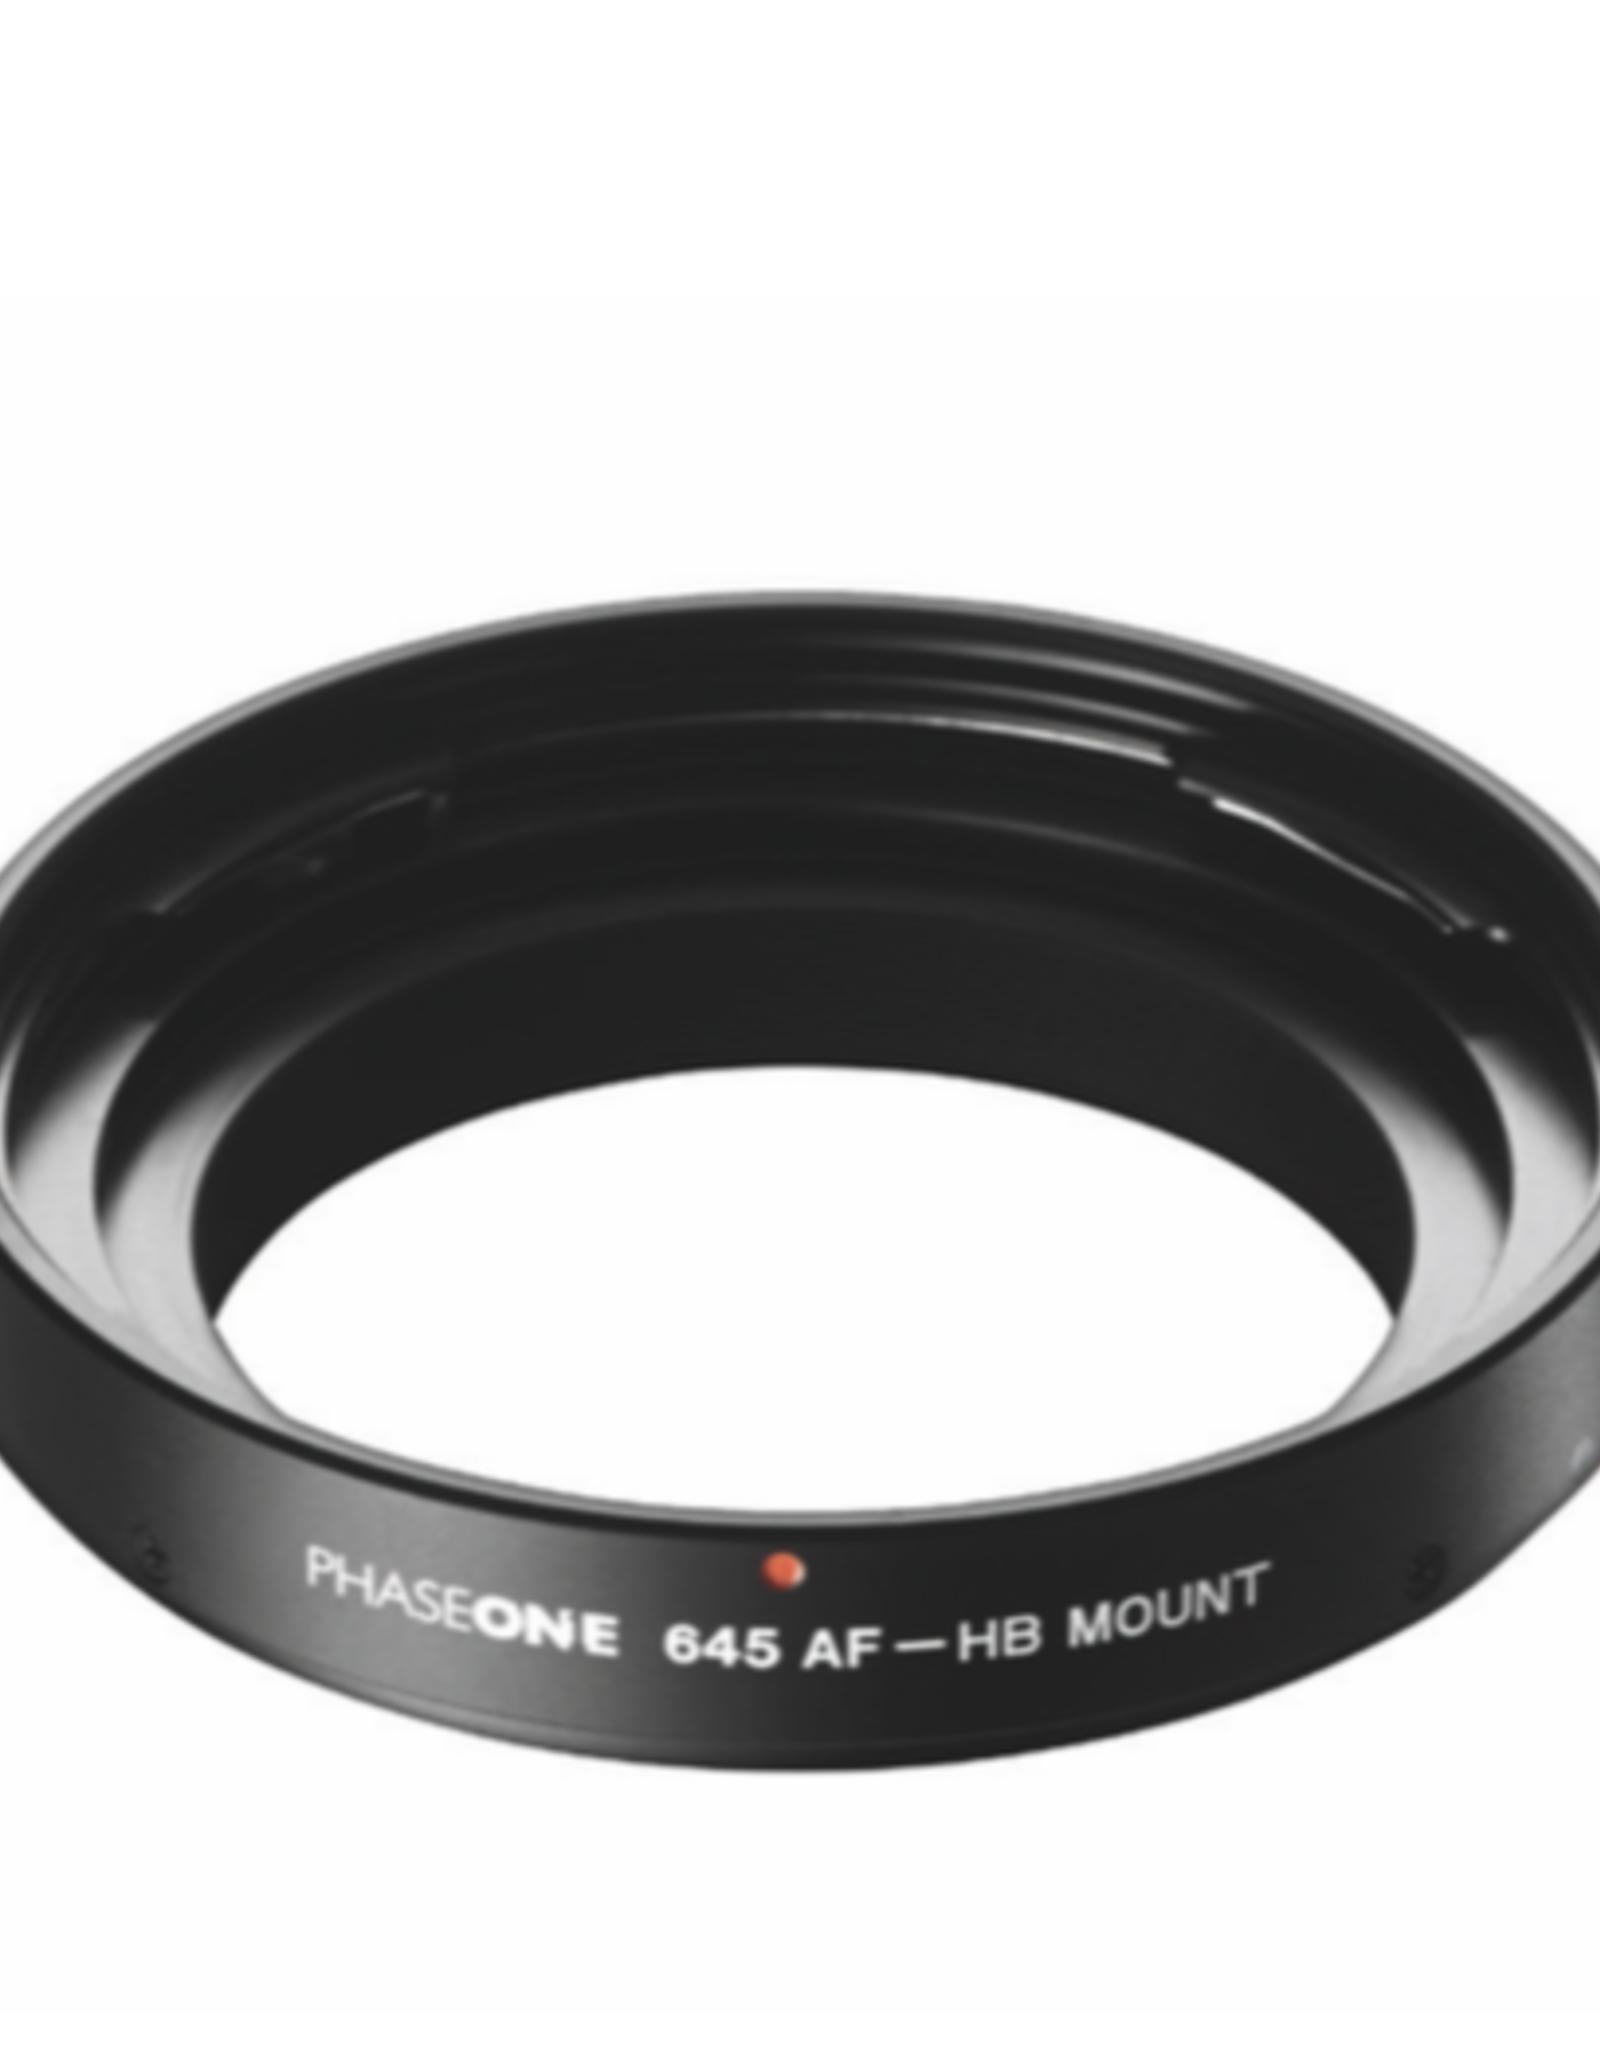 Phase One Phase One Multimount lens adaptor for Hasselblad V lenses